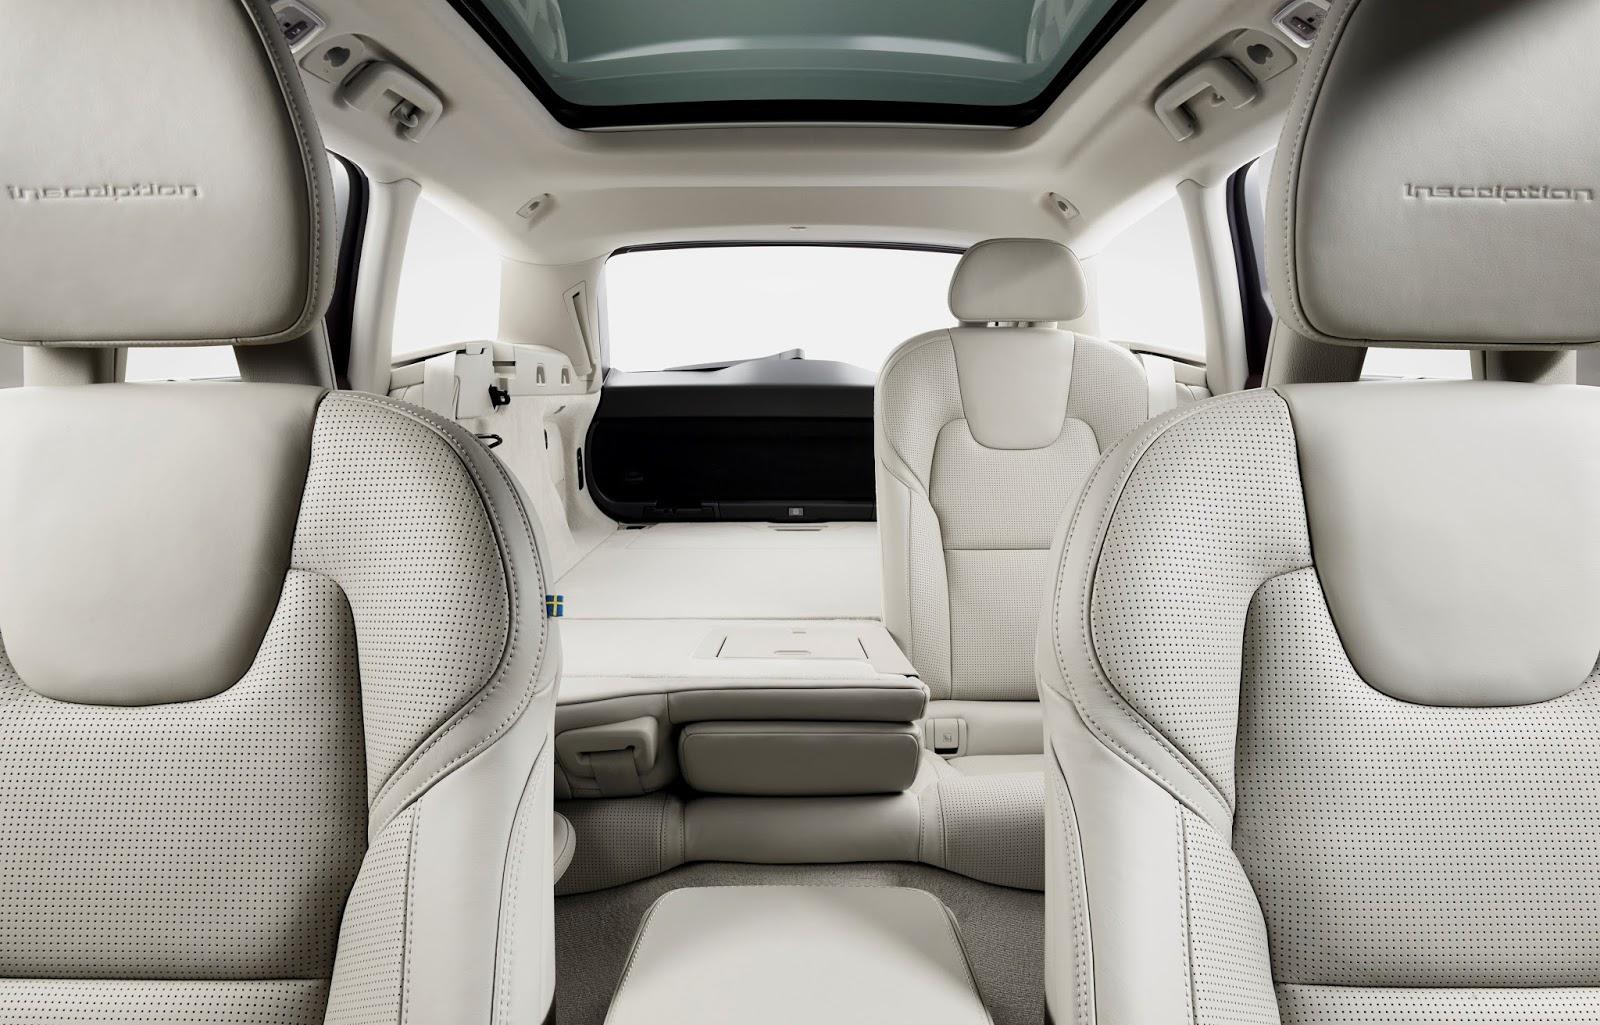 173842 Volvo V90 Studio Folding Rear seats Το V90 είναι το πιο όμορφο, το πιο ασφαλές station wagon και το πιο... Volvo Station Wagon, Volvo, Volvo V90